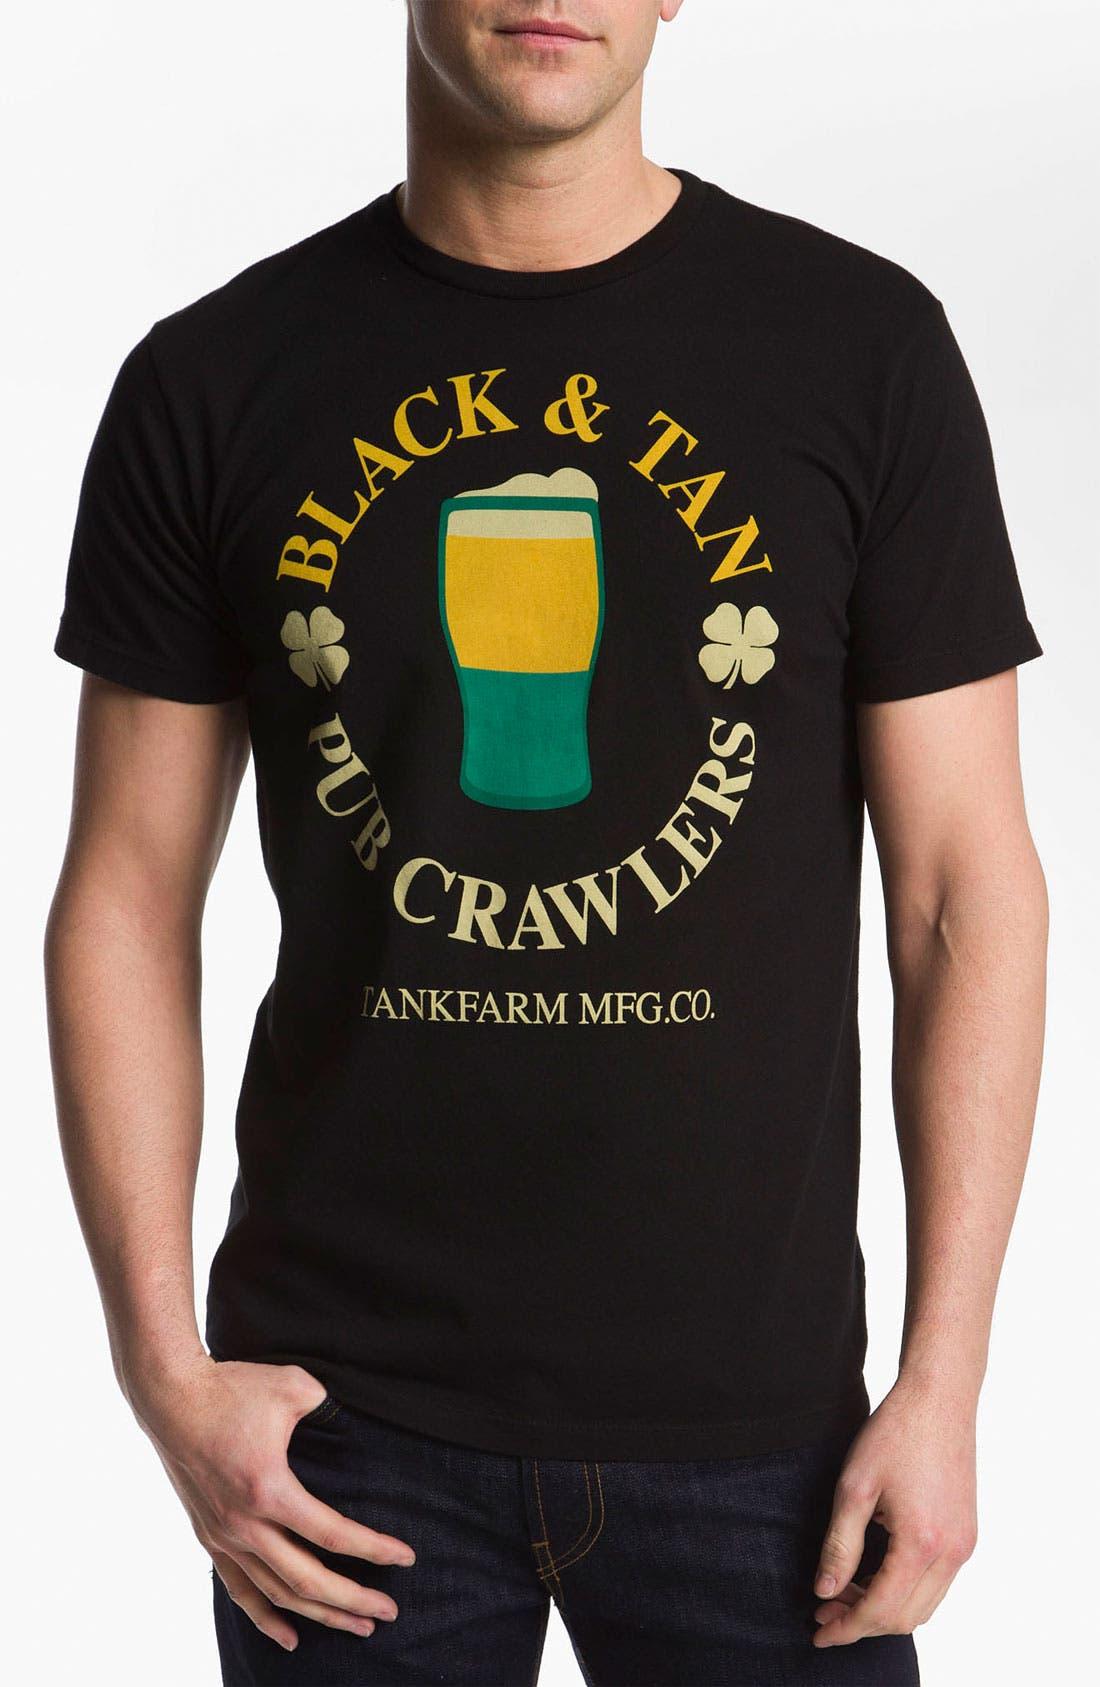 Alternate Image 1 Selected - Tankfarm 'Black & Tan' T-Shirt